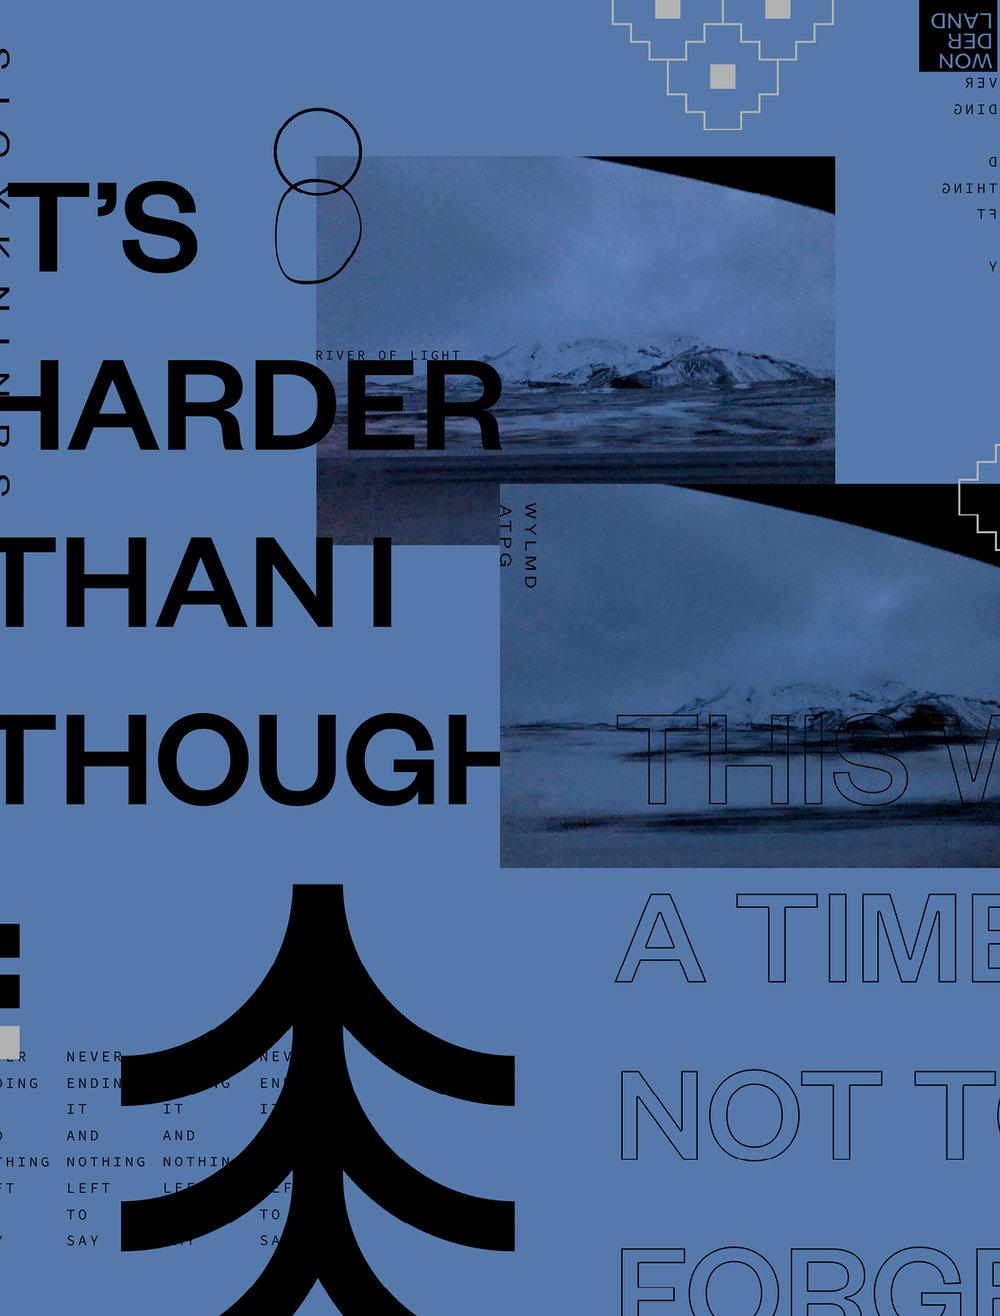 JosiahArt_Sept2018_Posters7.jpg